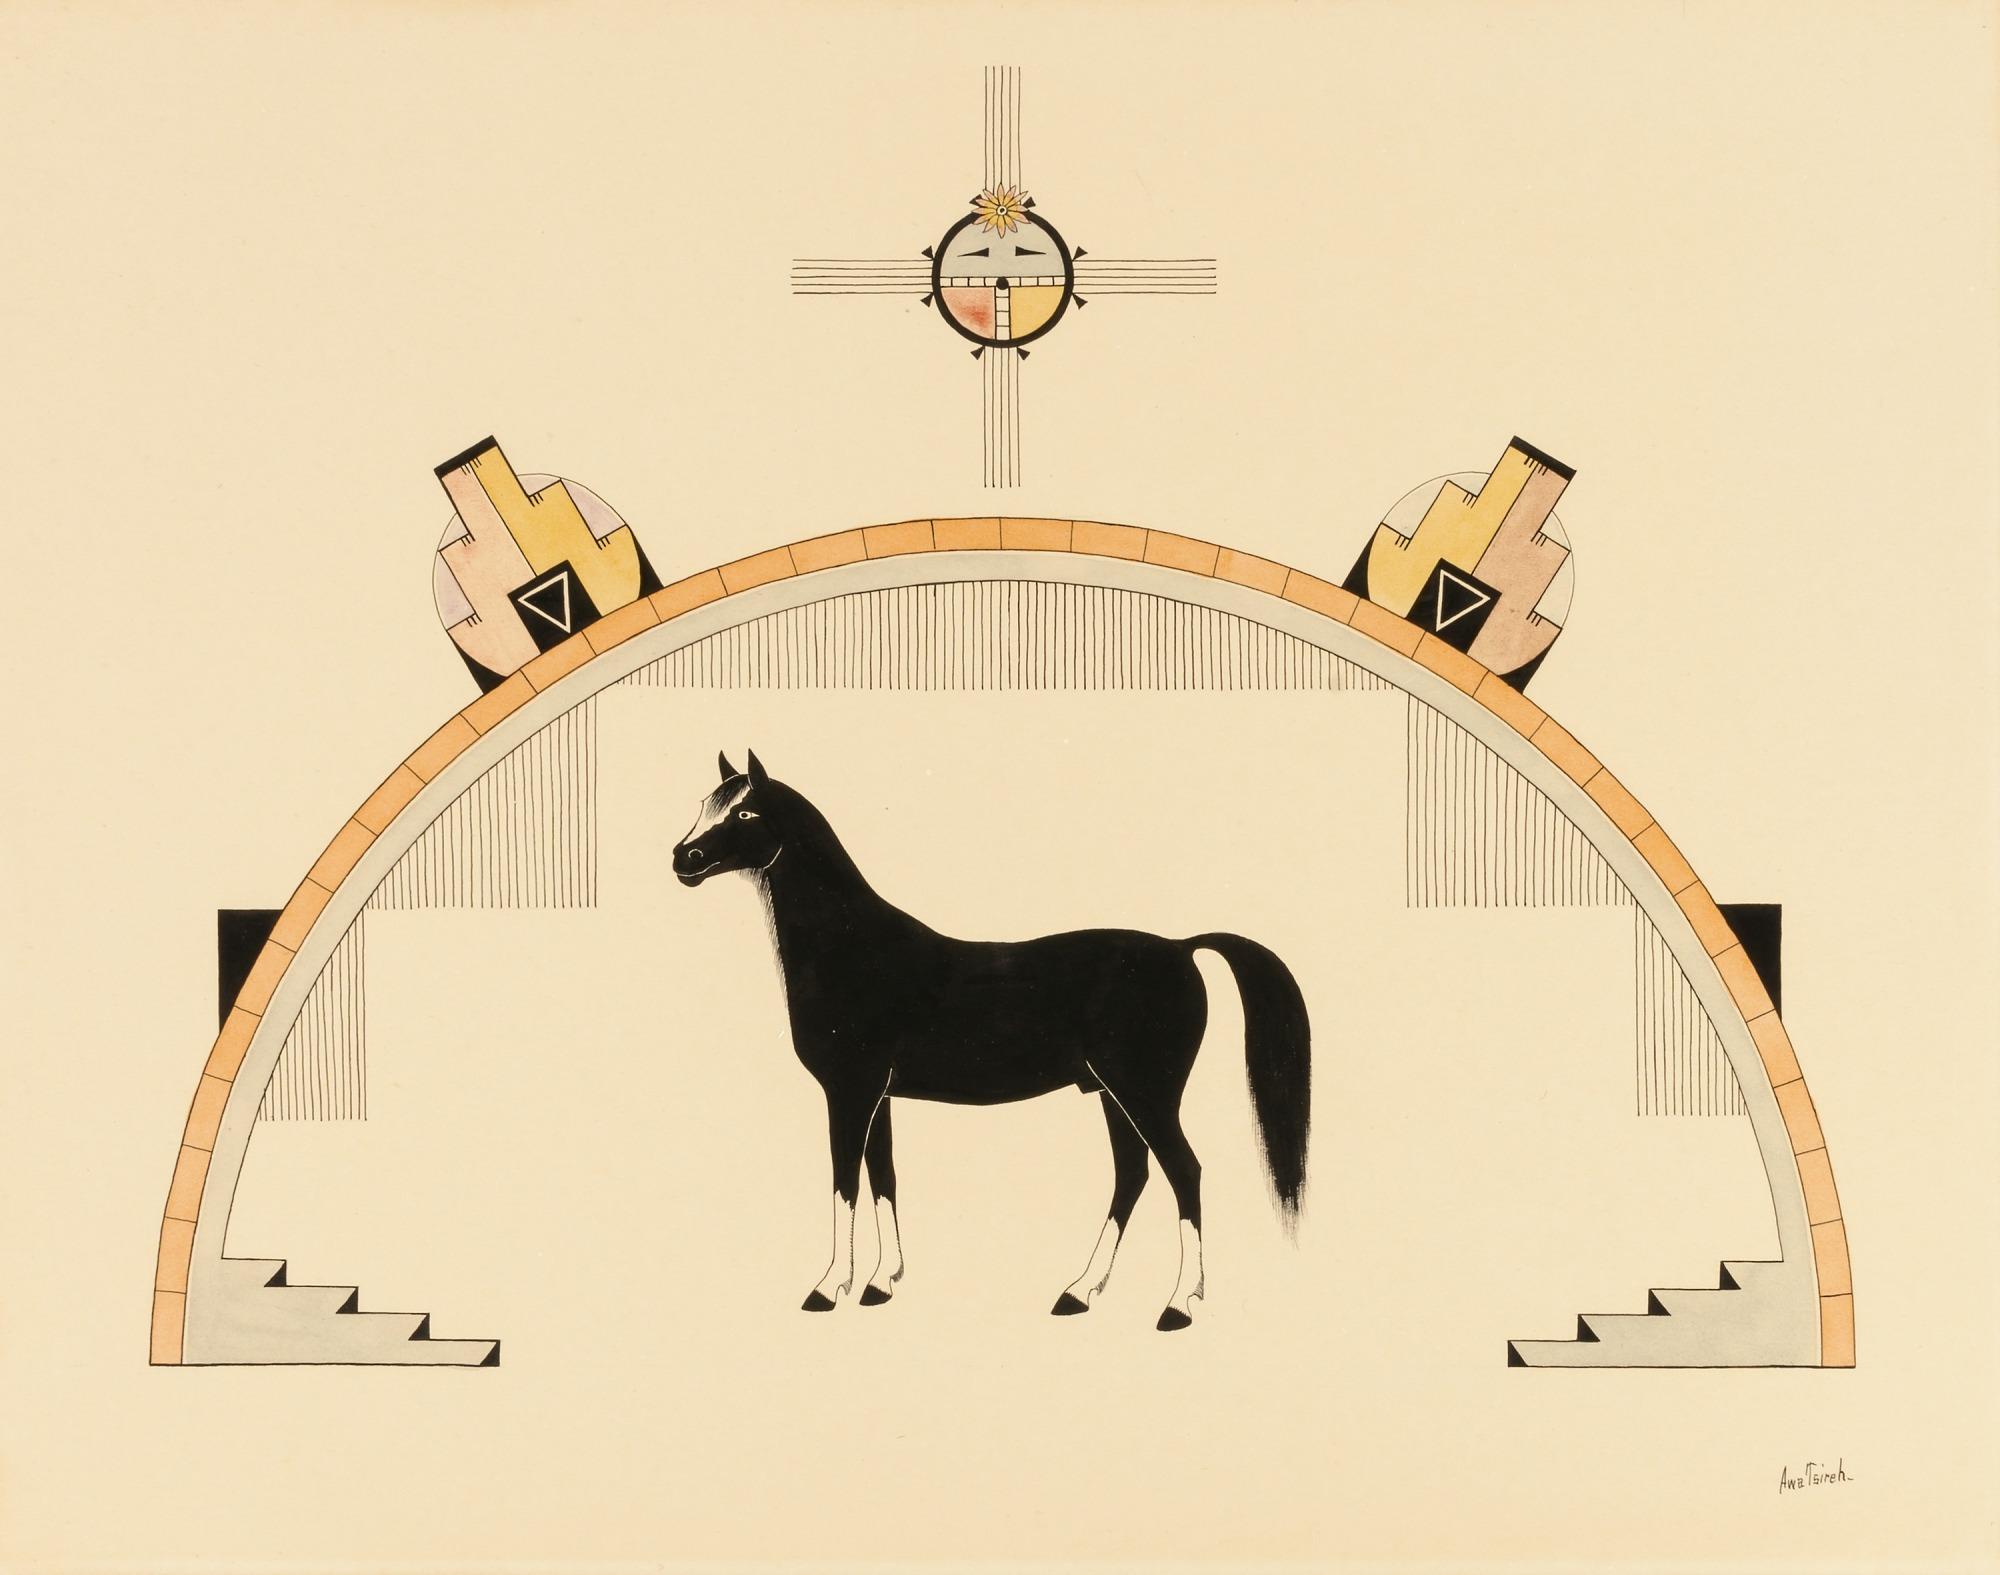 Black Horse Smithsonian American Art Museum